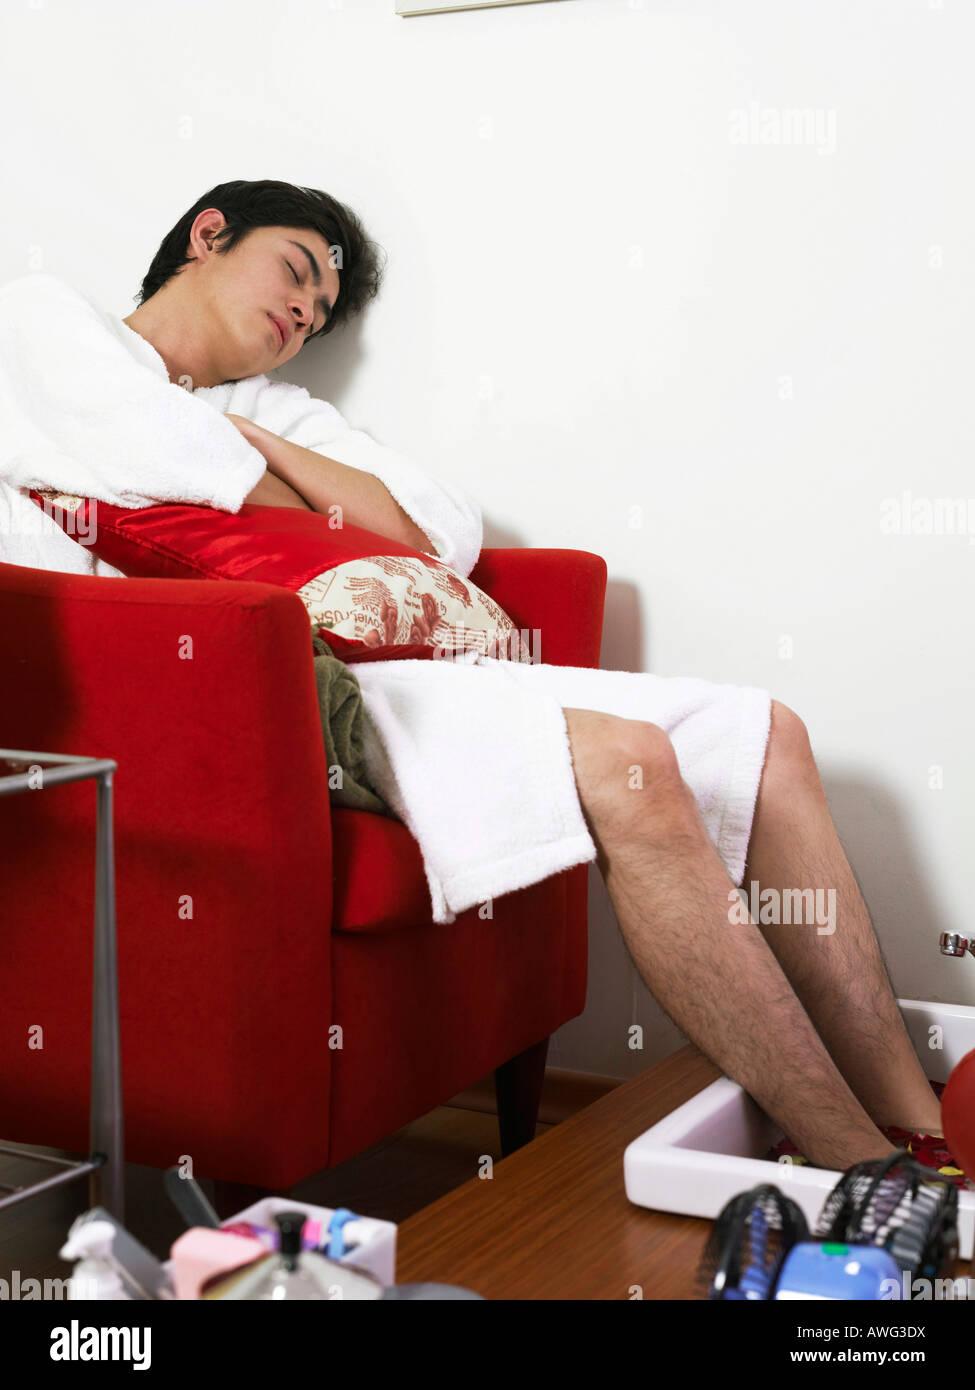 man having a foot bath at a health spa Stock Photo: 16571797 - Alamy